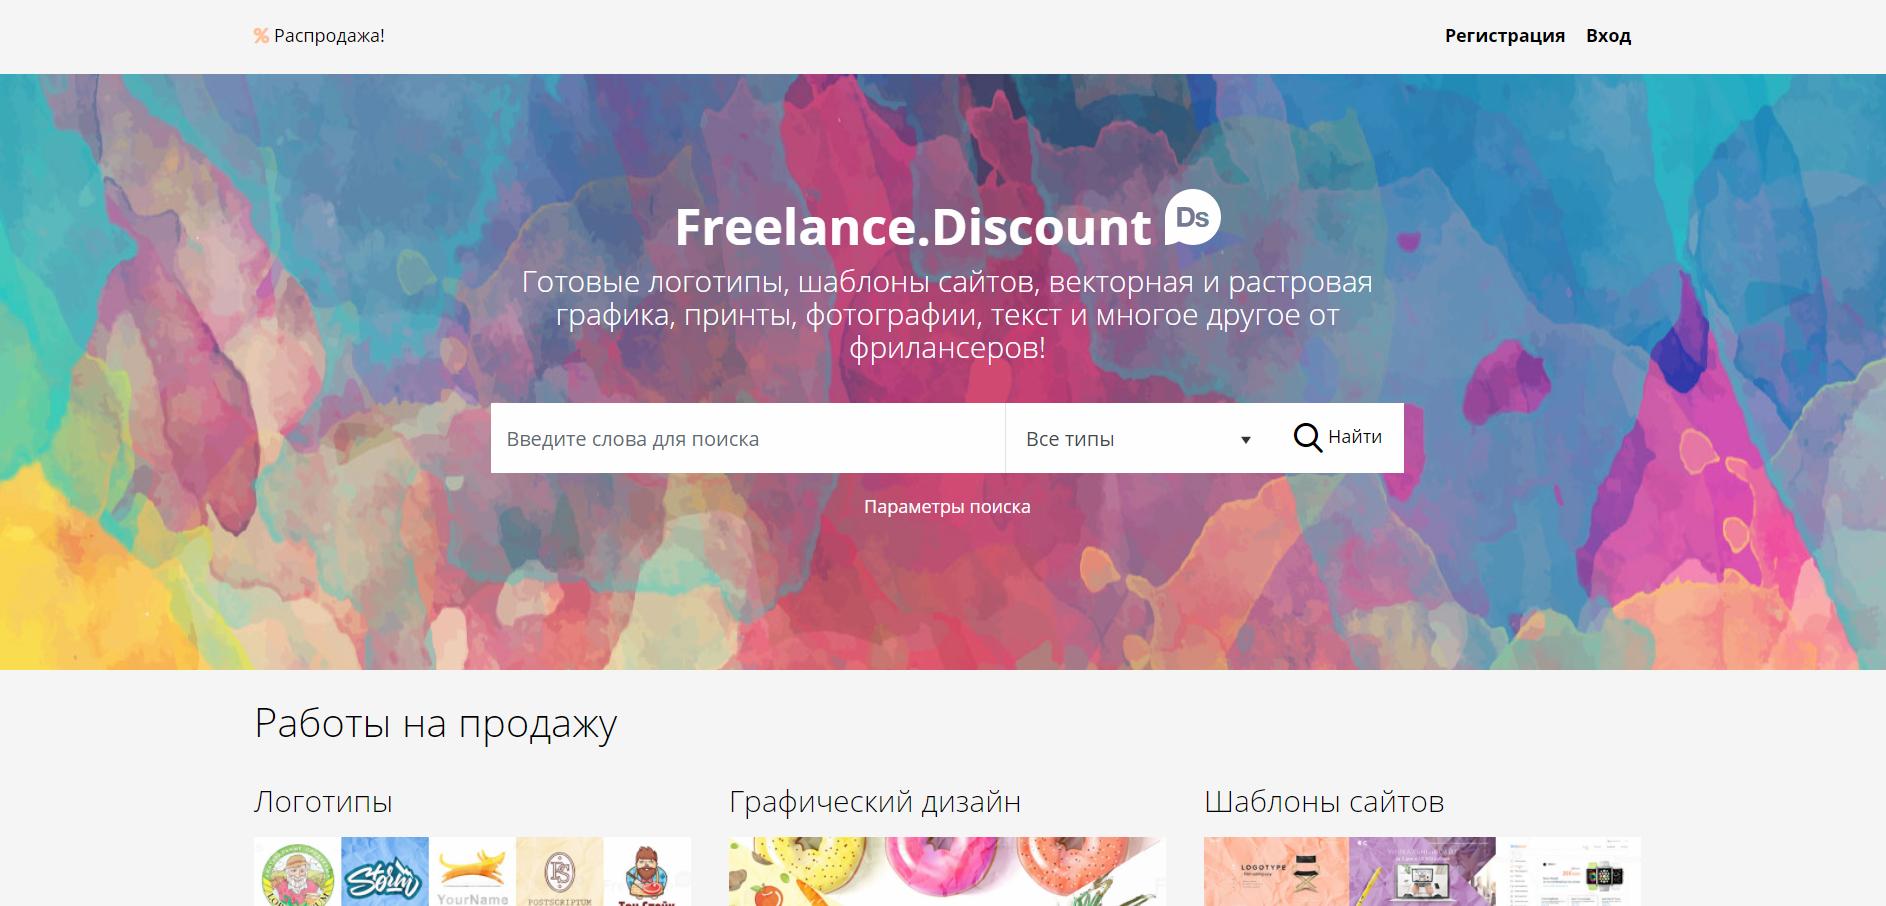 Freelance.discount